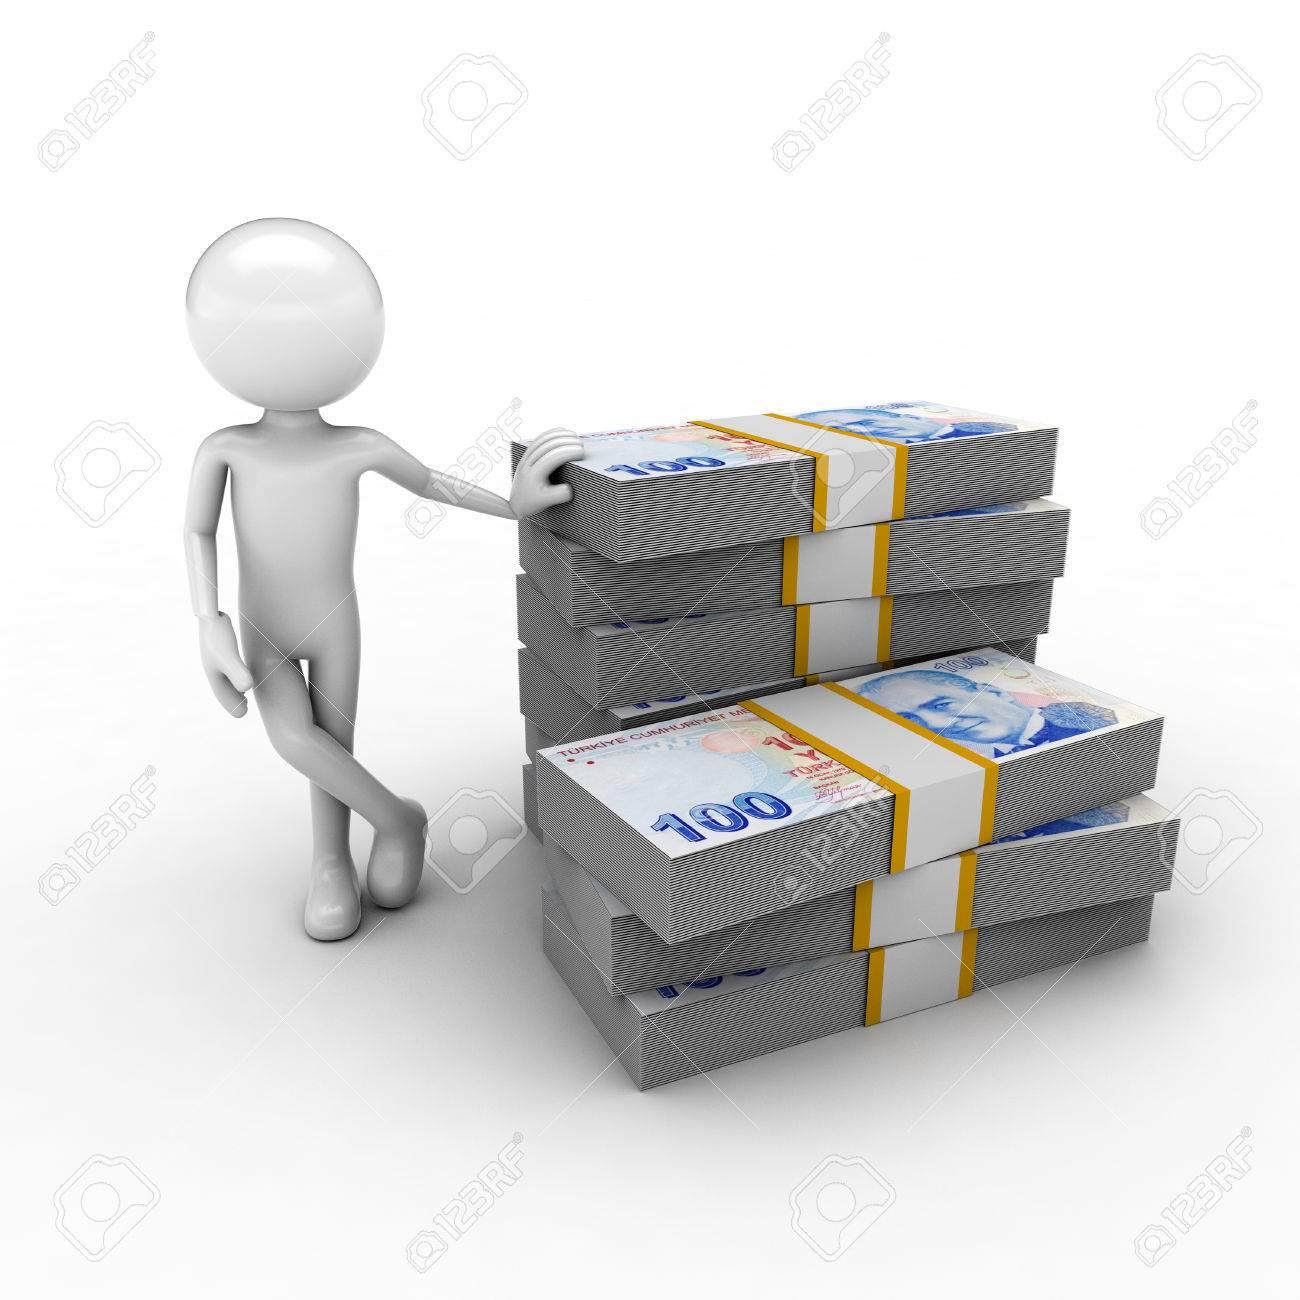 visual describing the economy using monetary and human figures Stock Photo - 57570162